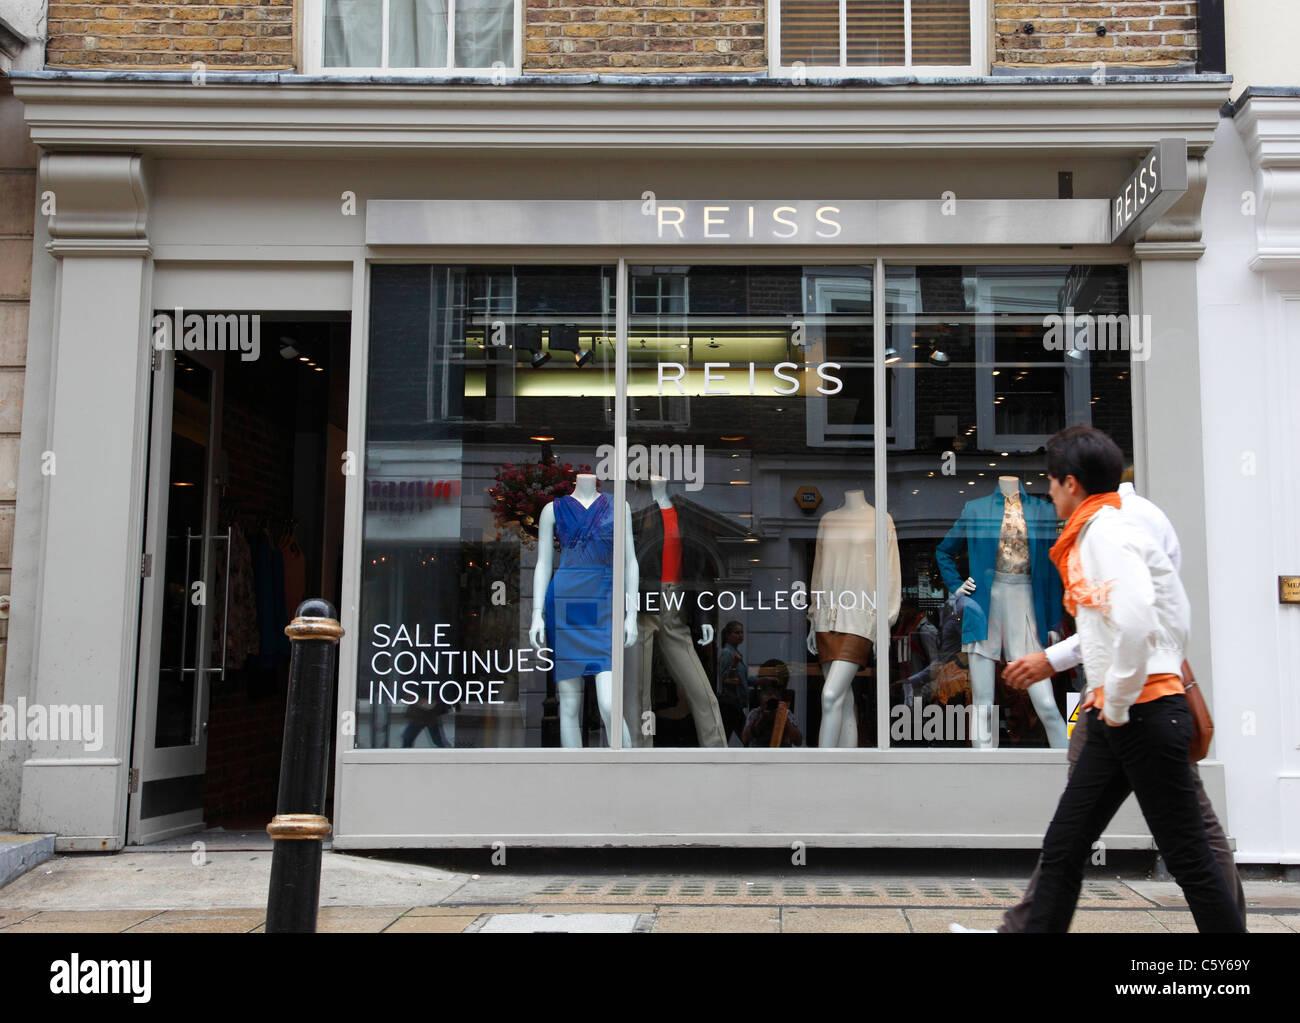 A Reiss store on South Molton Street, London, England, U.K. - Stock Image